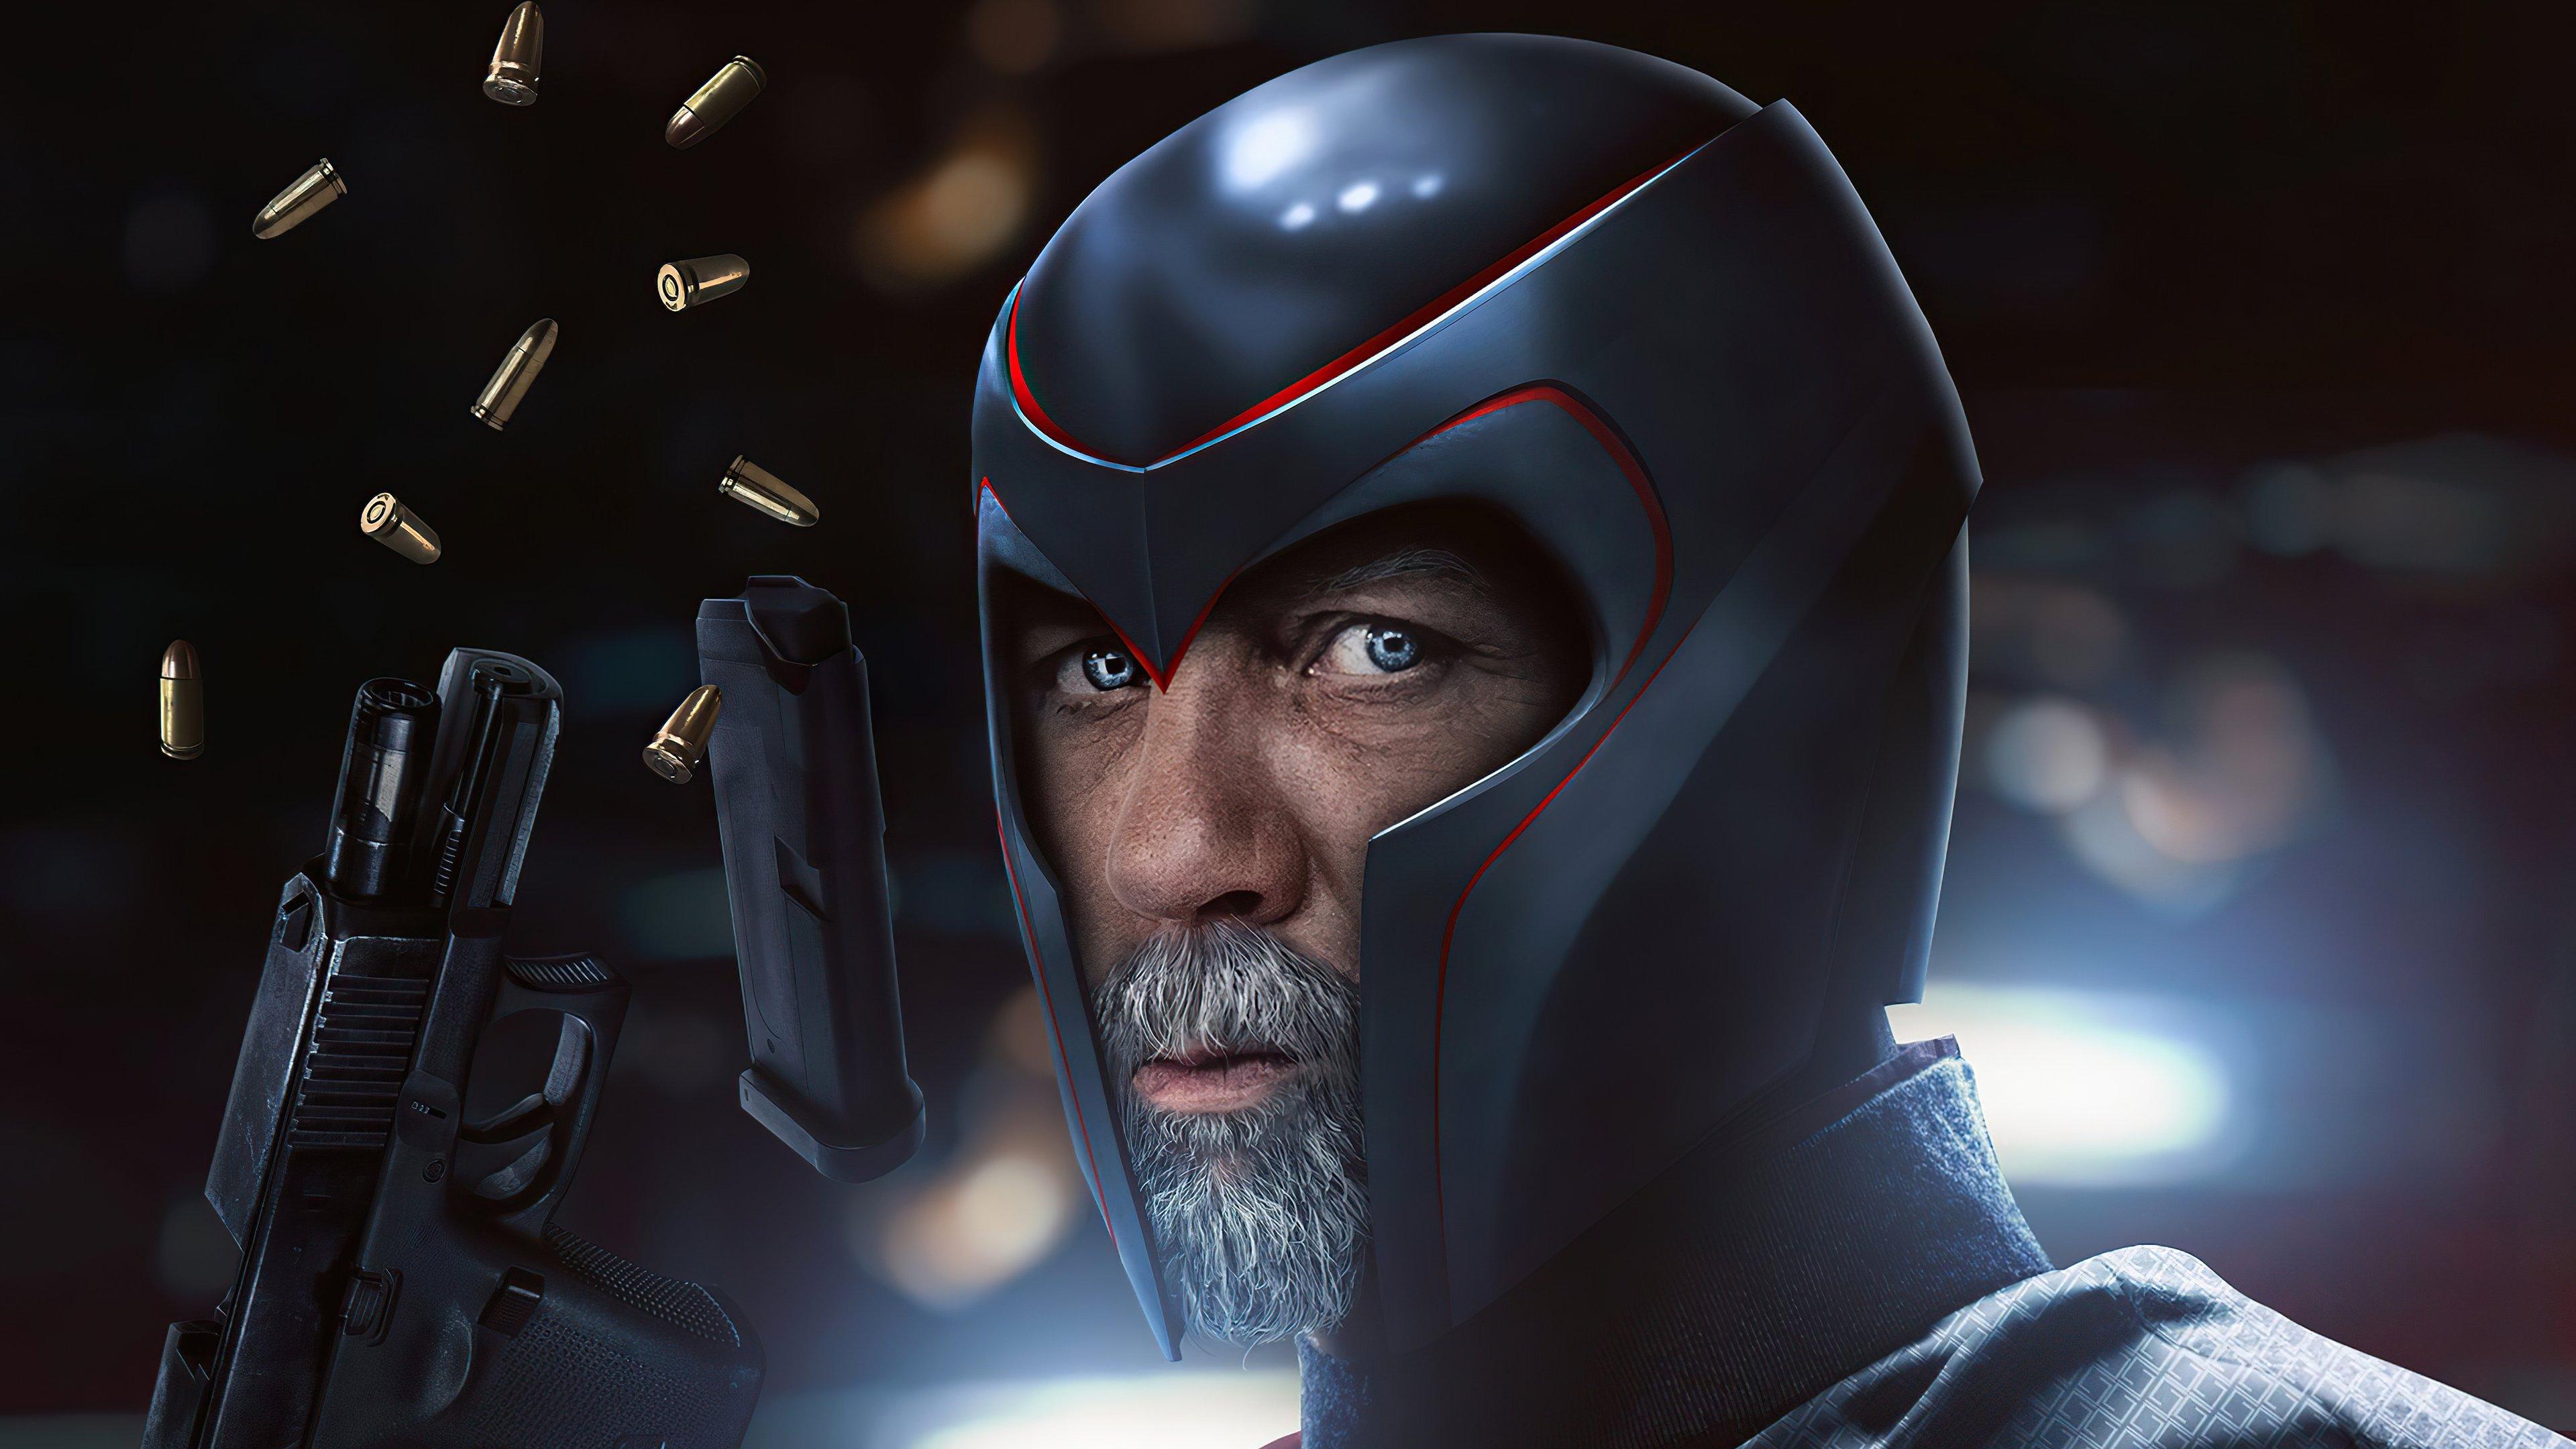 Wallpaper Daniel Graig as Magneto Xmen